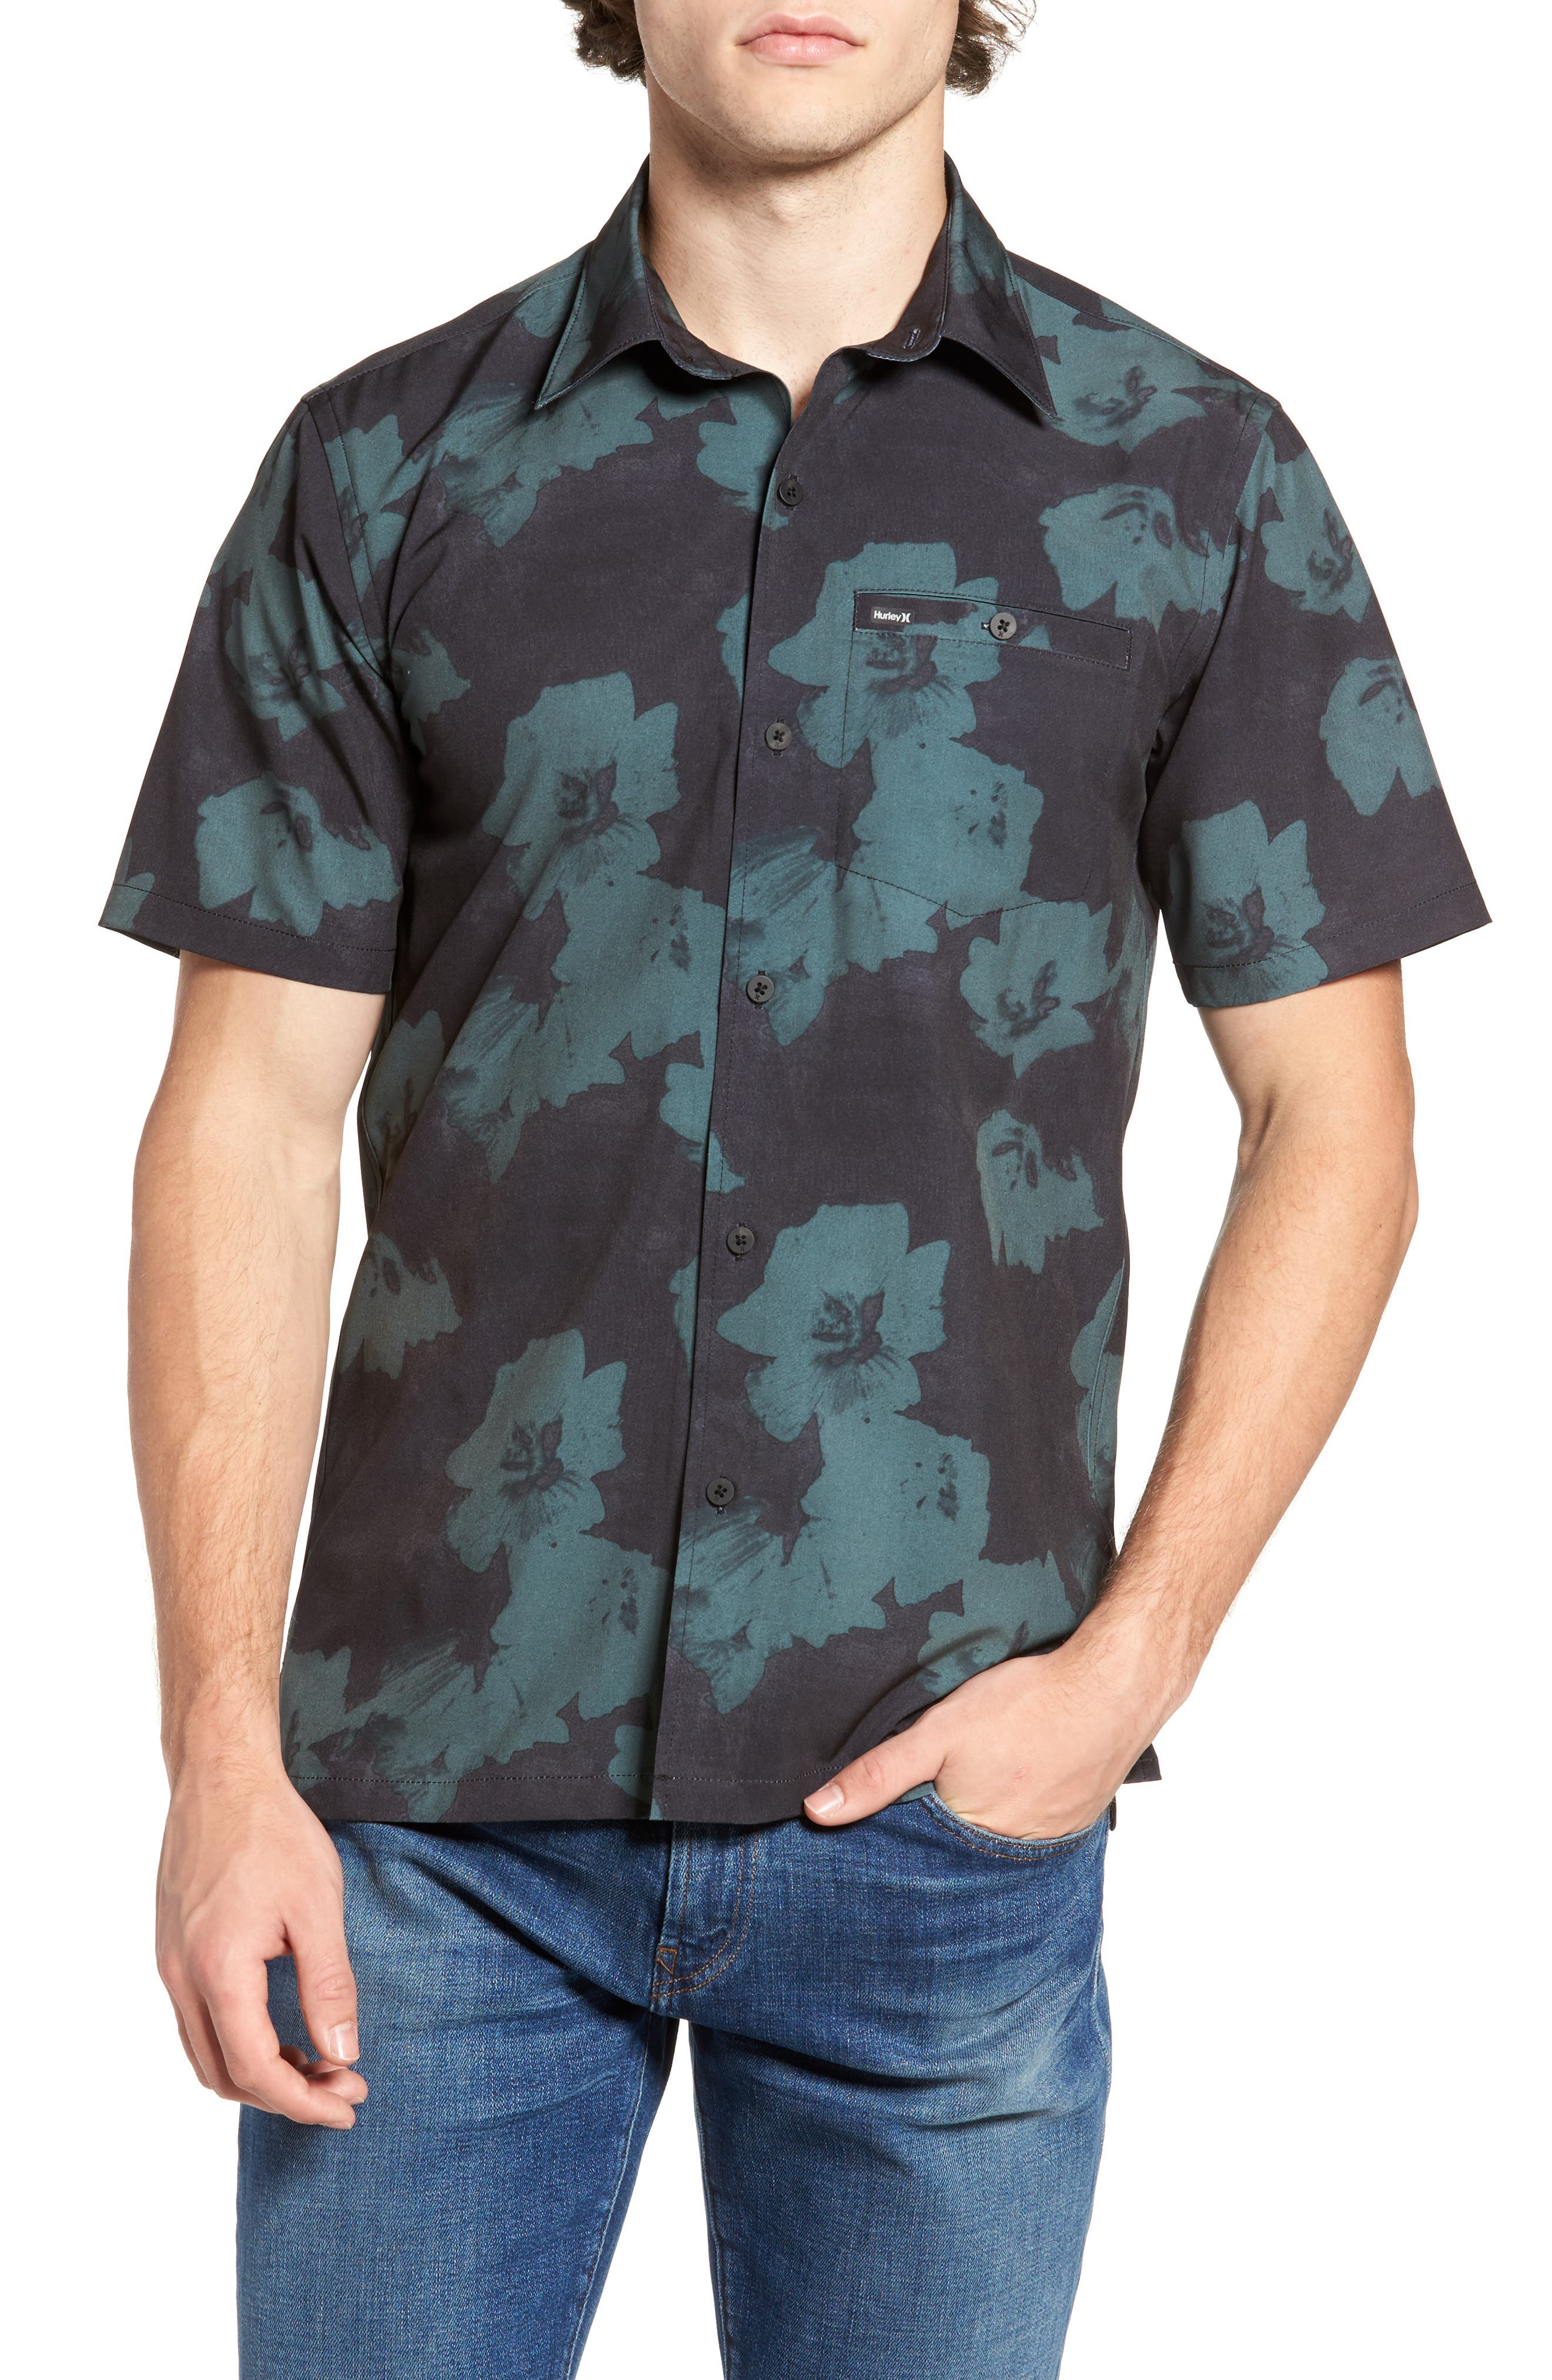 Hurley Slice of Paradise Woven Shirt